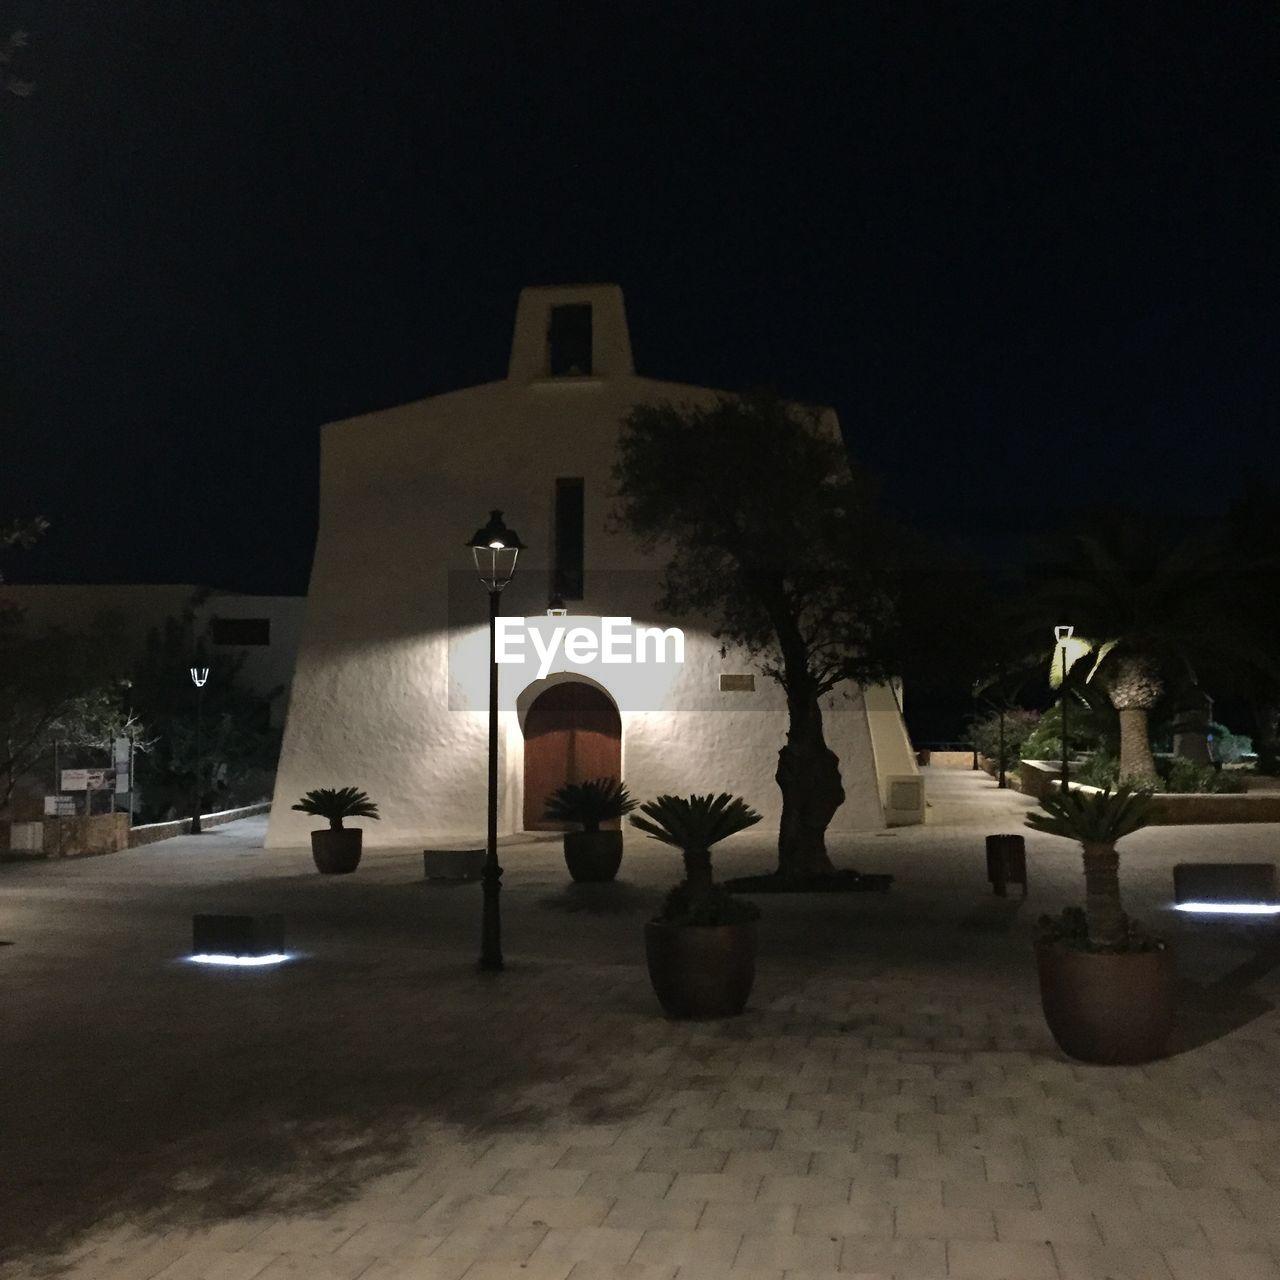 night, illuminated, lighting equipment, architecture, indoors, built structure, no people, building exterior, tree, sky